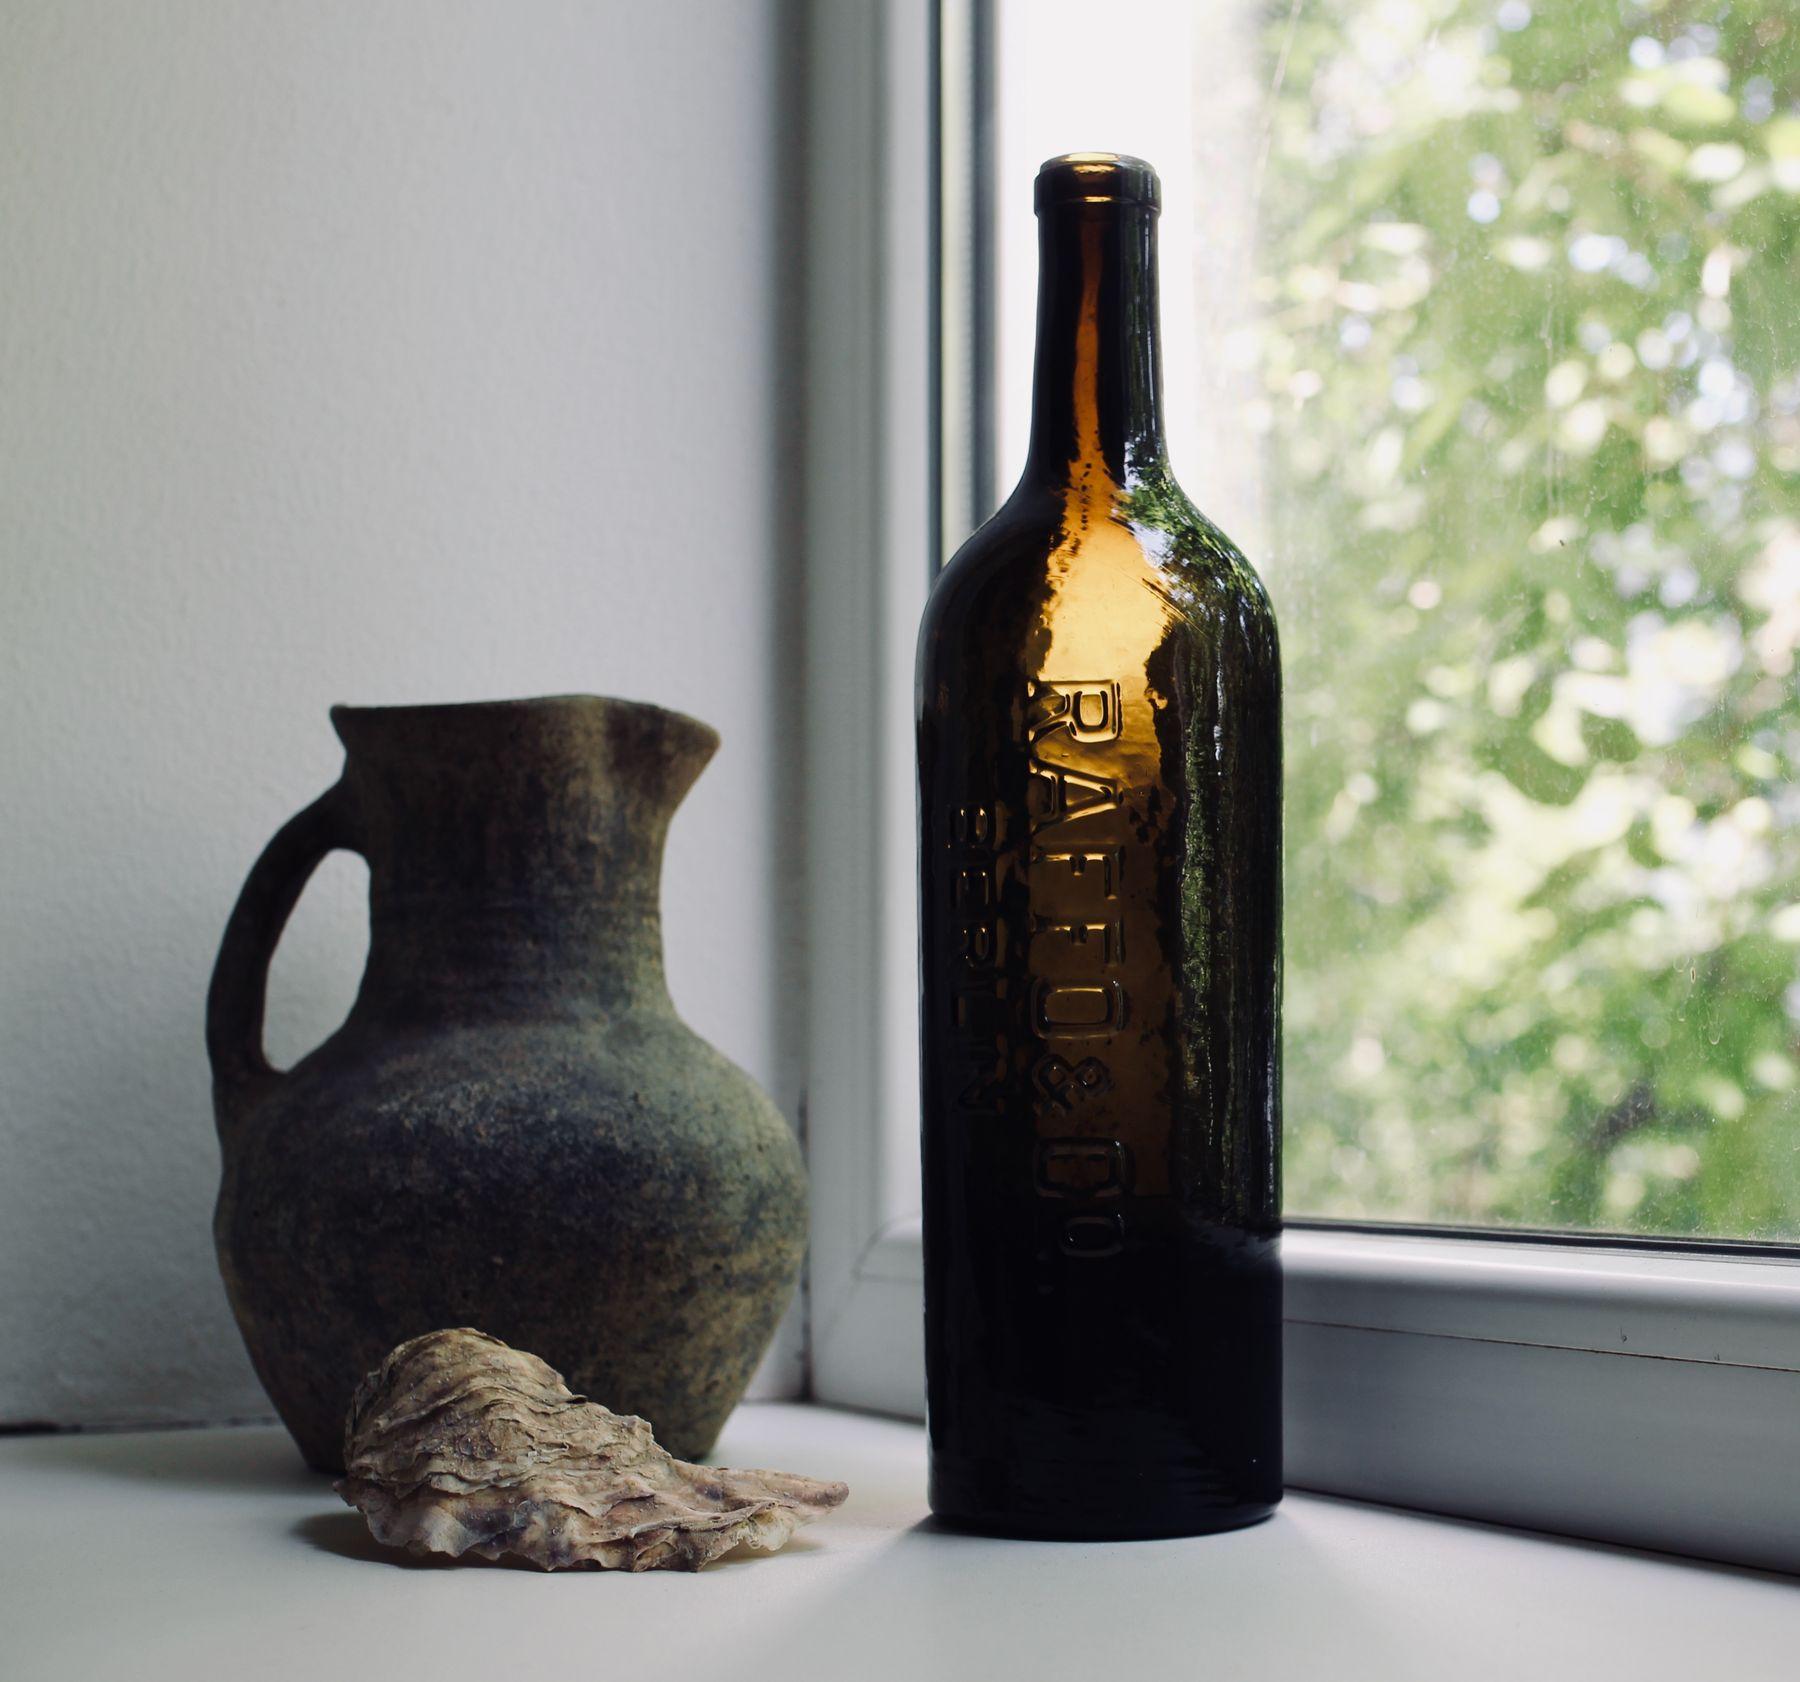 Устрица, бутылка и кувшин